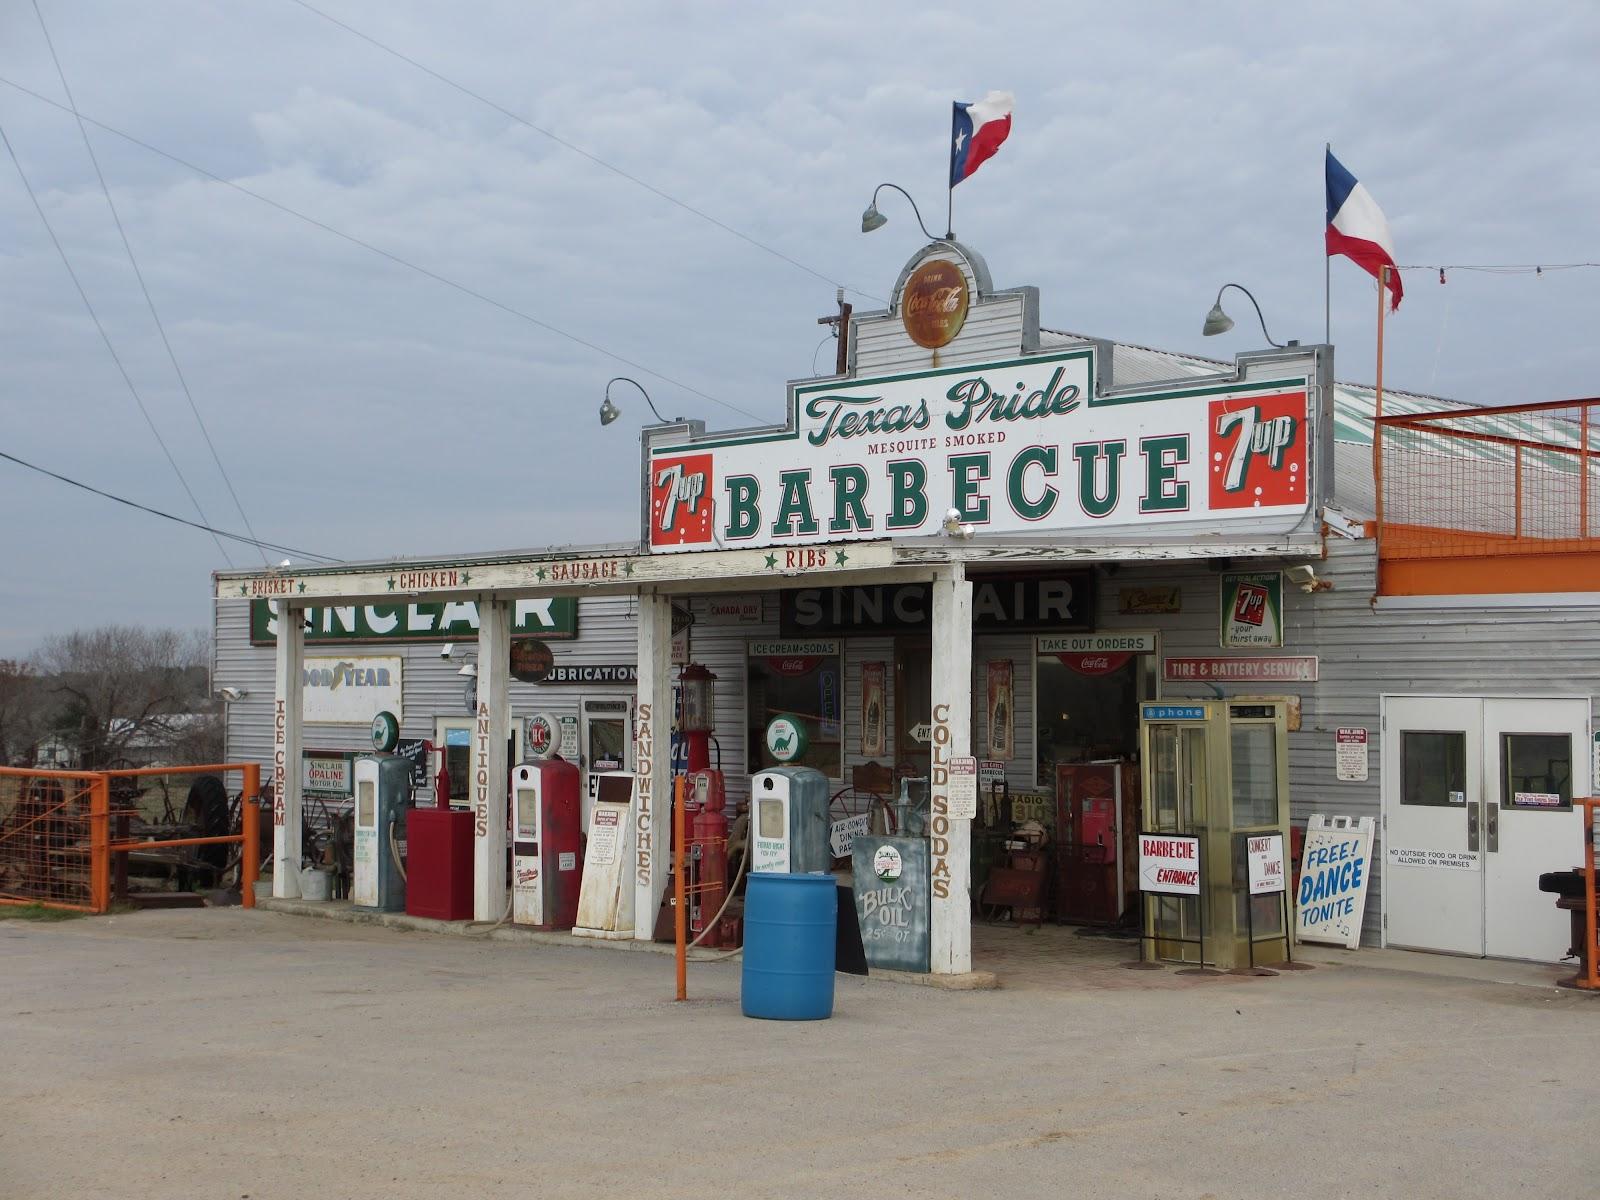 http://1.bp.blogspot.com/-wriSPXO_YnE/T0eVTKB19VI/AAAAAAAAMe8/sf9Dz4W65gQ/s1600/A2+Texas+Pride.JPG